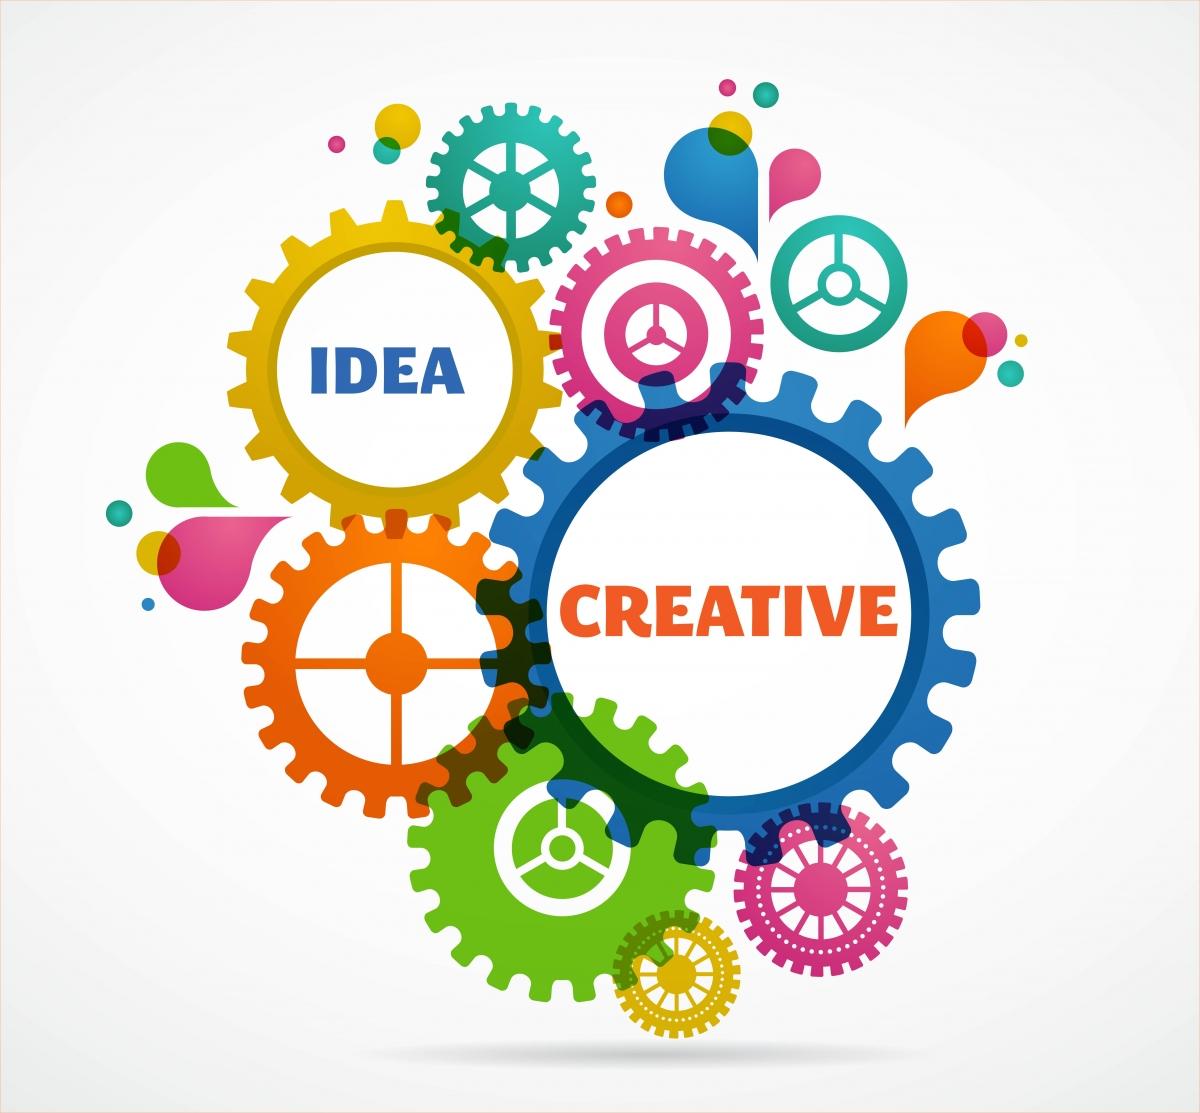 Galerry idea uk design and marketing ltd